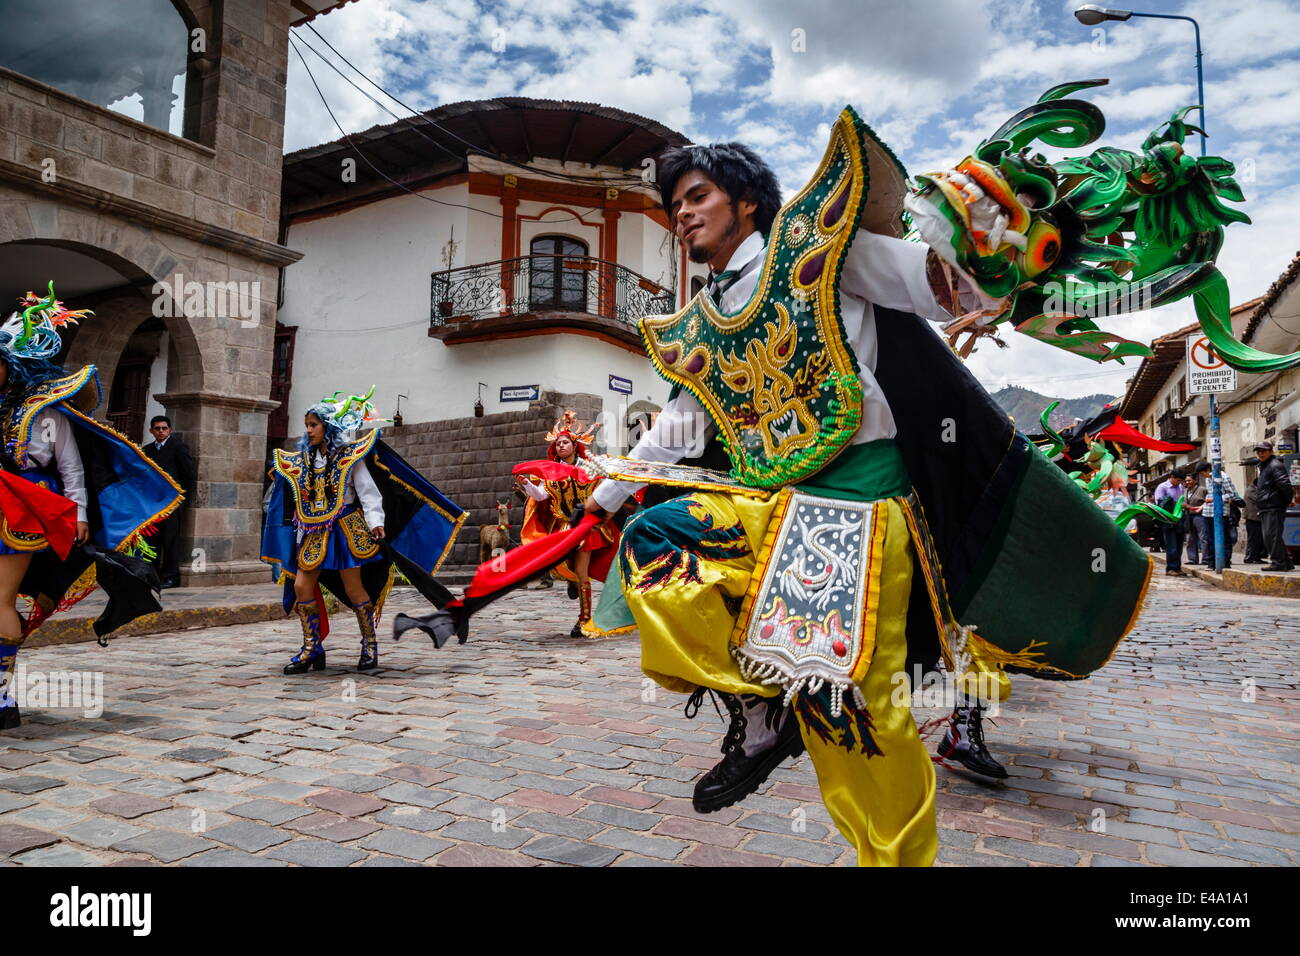 A religious procession, Cuzco, Peru, South America - Stock Image